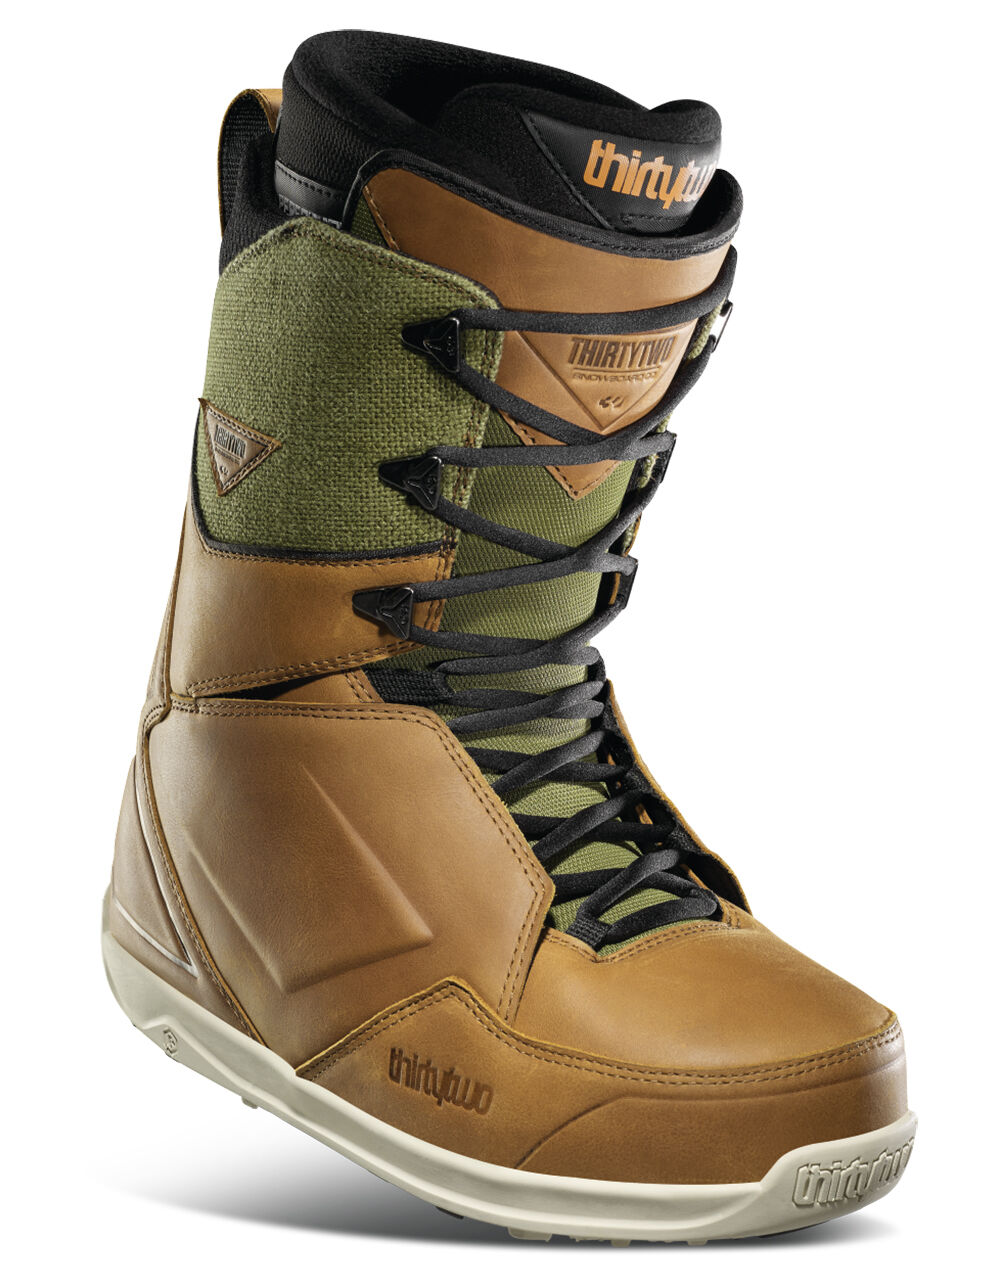 THIRTYTWO Lashed Premium Boots